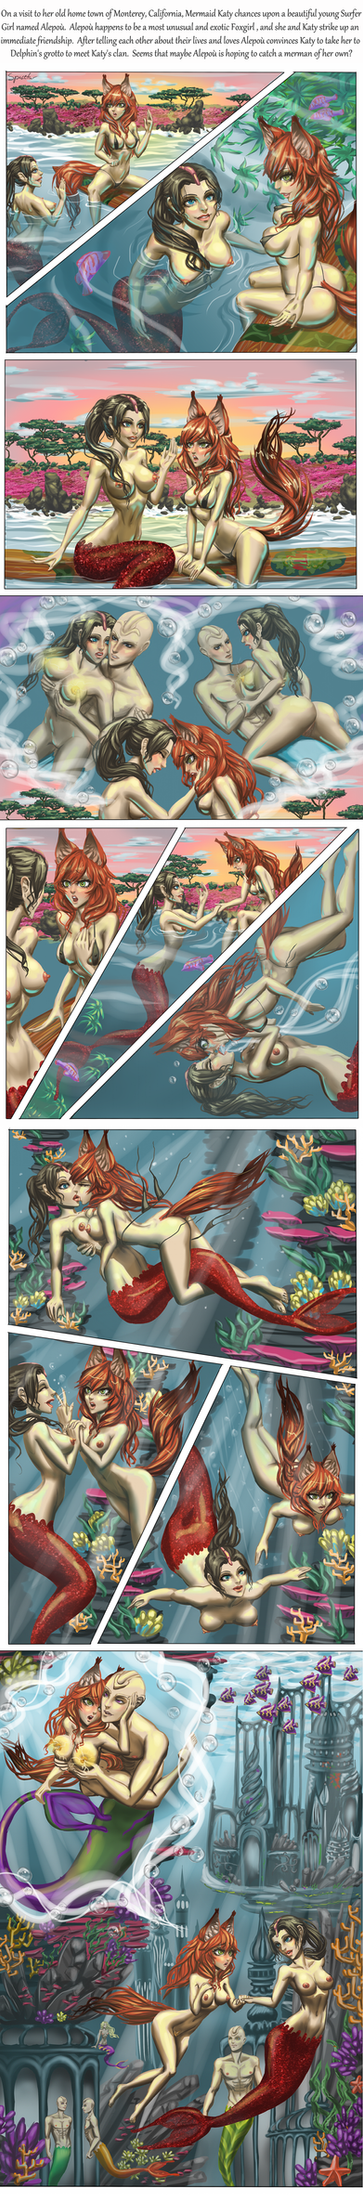 Commission: Mermaid Katy and Foxgirl Alepou by SpaceFur